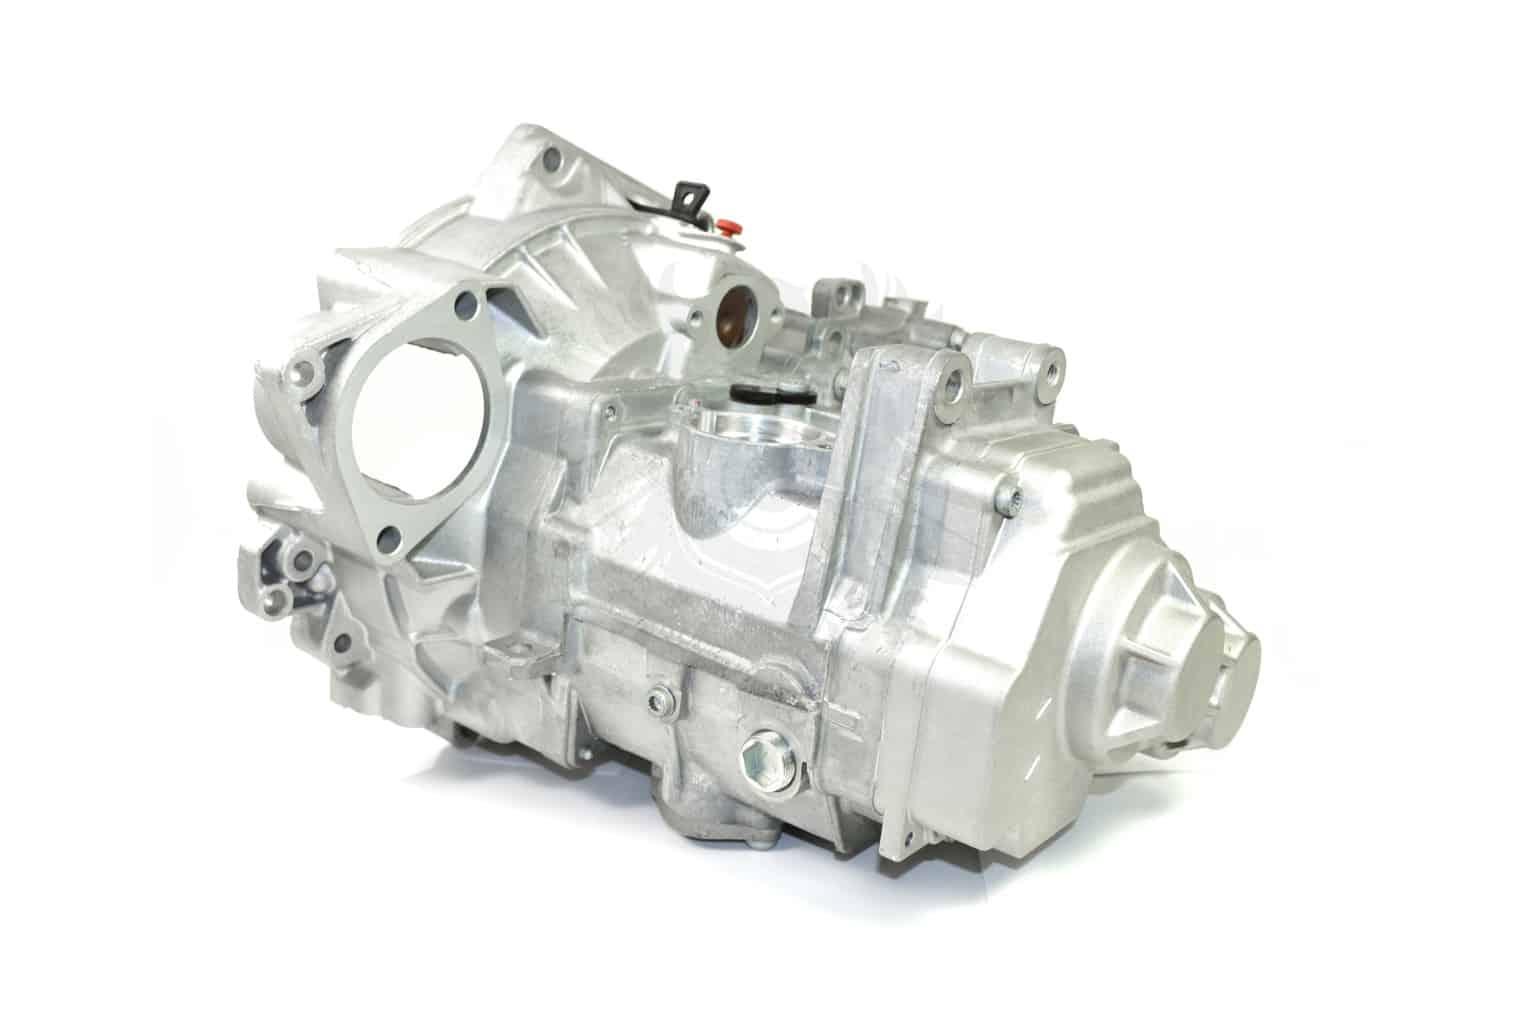 6 Speed Transmission >> 02s 02j 5 To 6 Speed Manual Transmission Mk5 Golf Jetta 2 0t 2 5